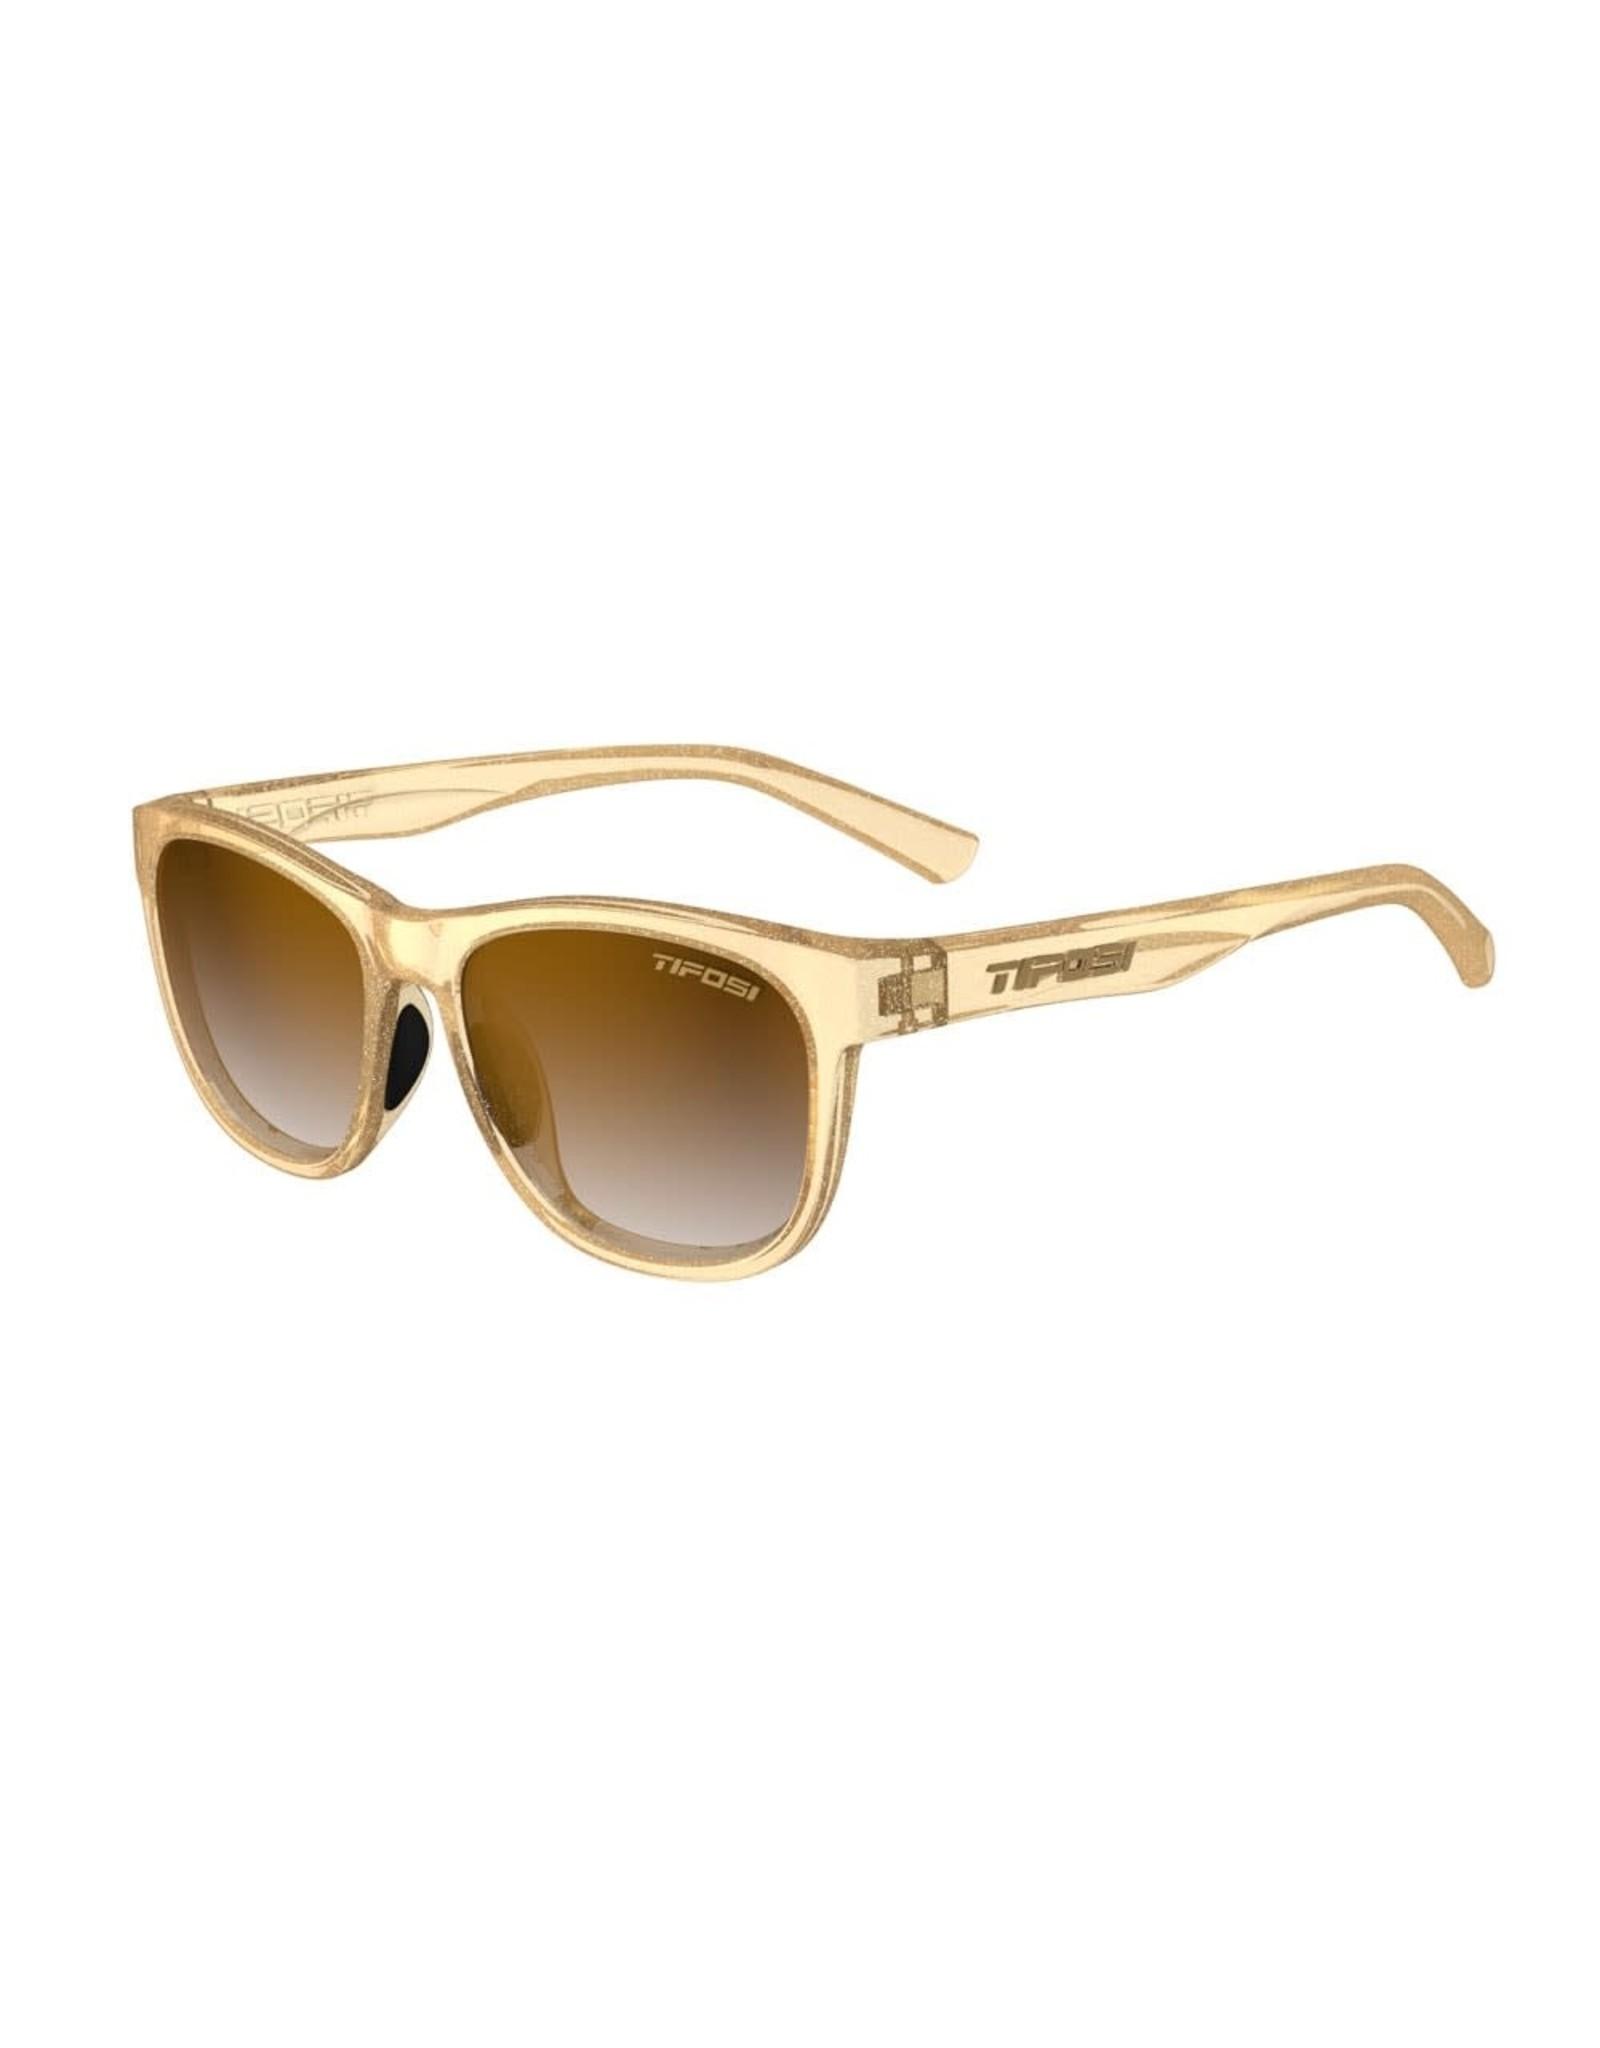 Tifosi Optics Swank Glitter, Gold Shine Brown Gradient Glasses